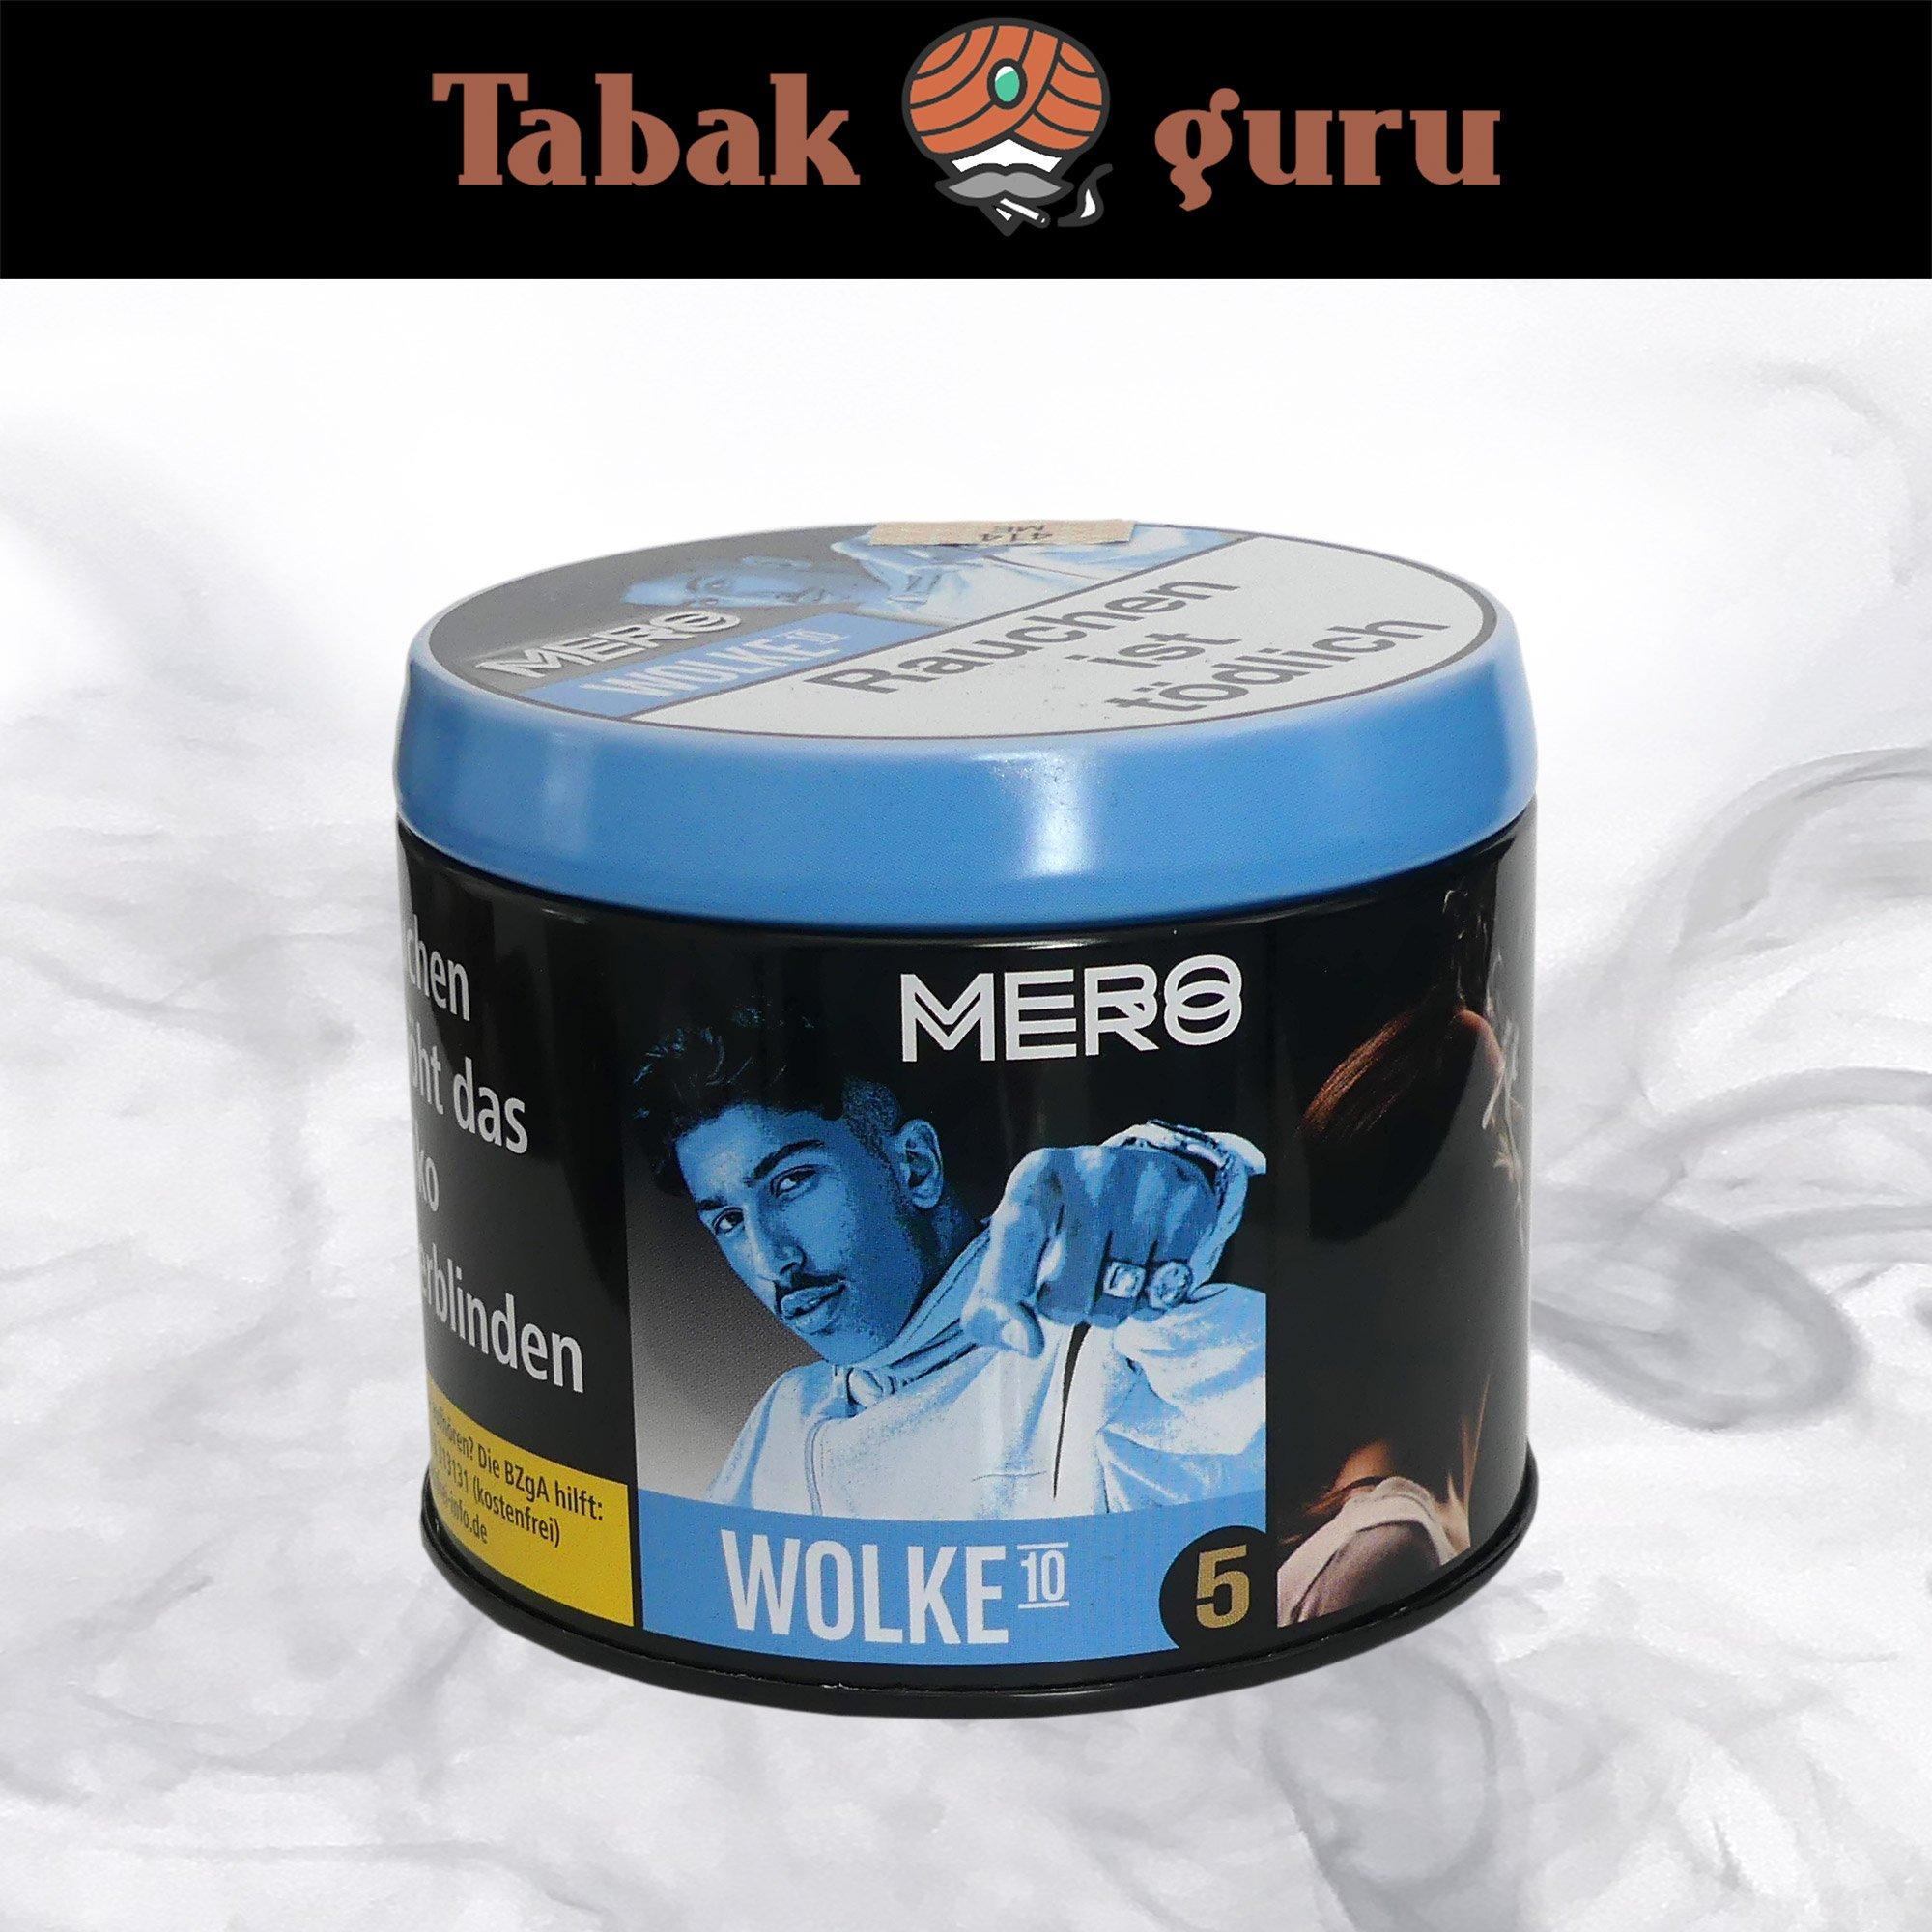 Mero Shisha Tabak - Wolke 10 200g